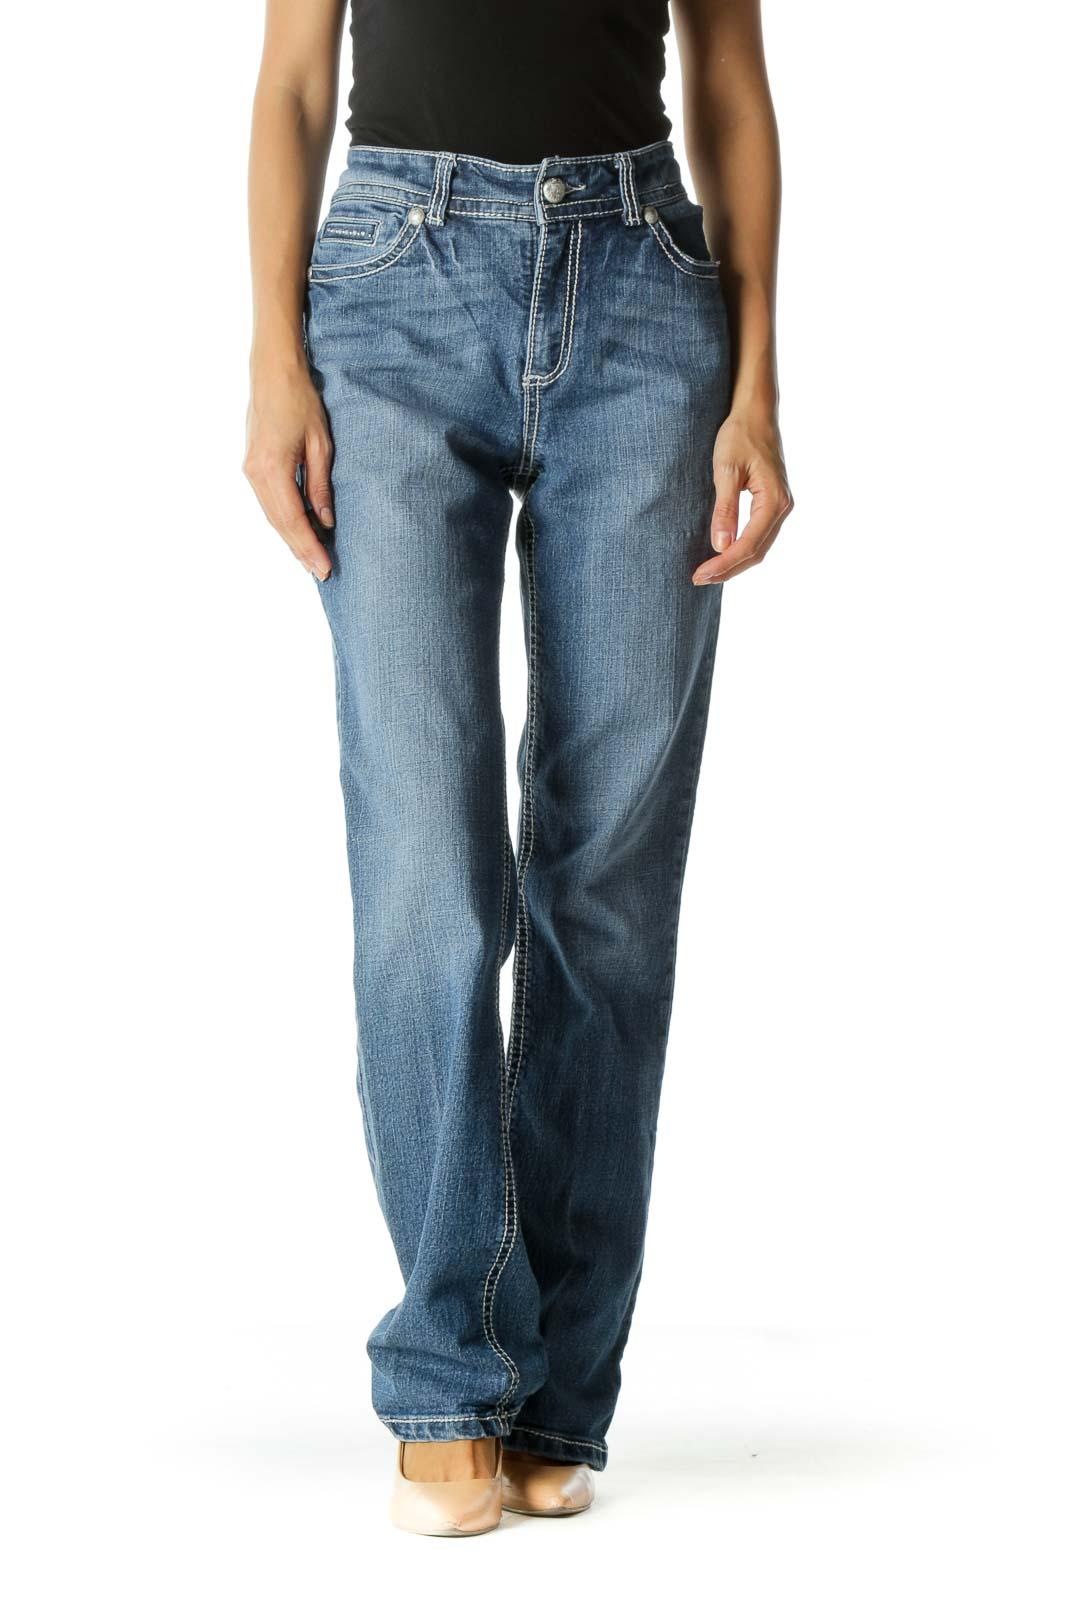 Blue Medium Wash Straight Leg Jeans Front